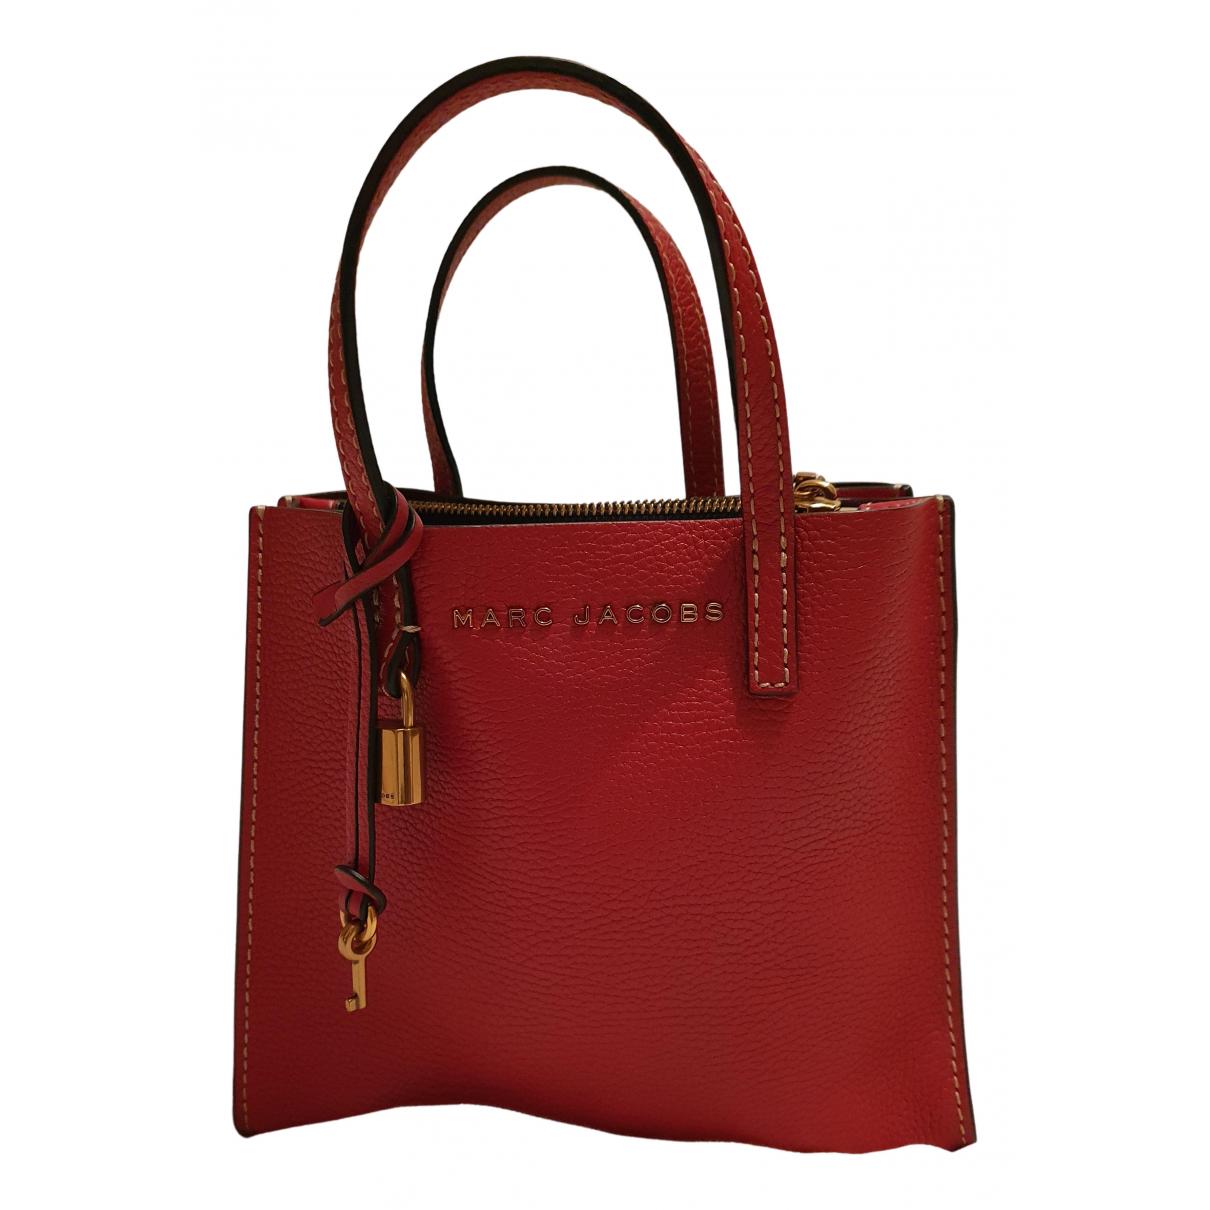 Marc Jacobs N Red Leather handbag for Women N